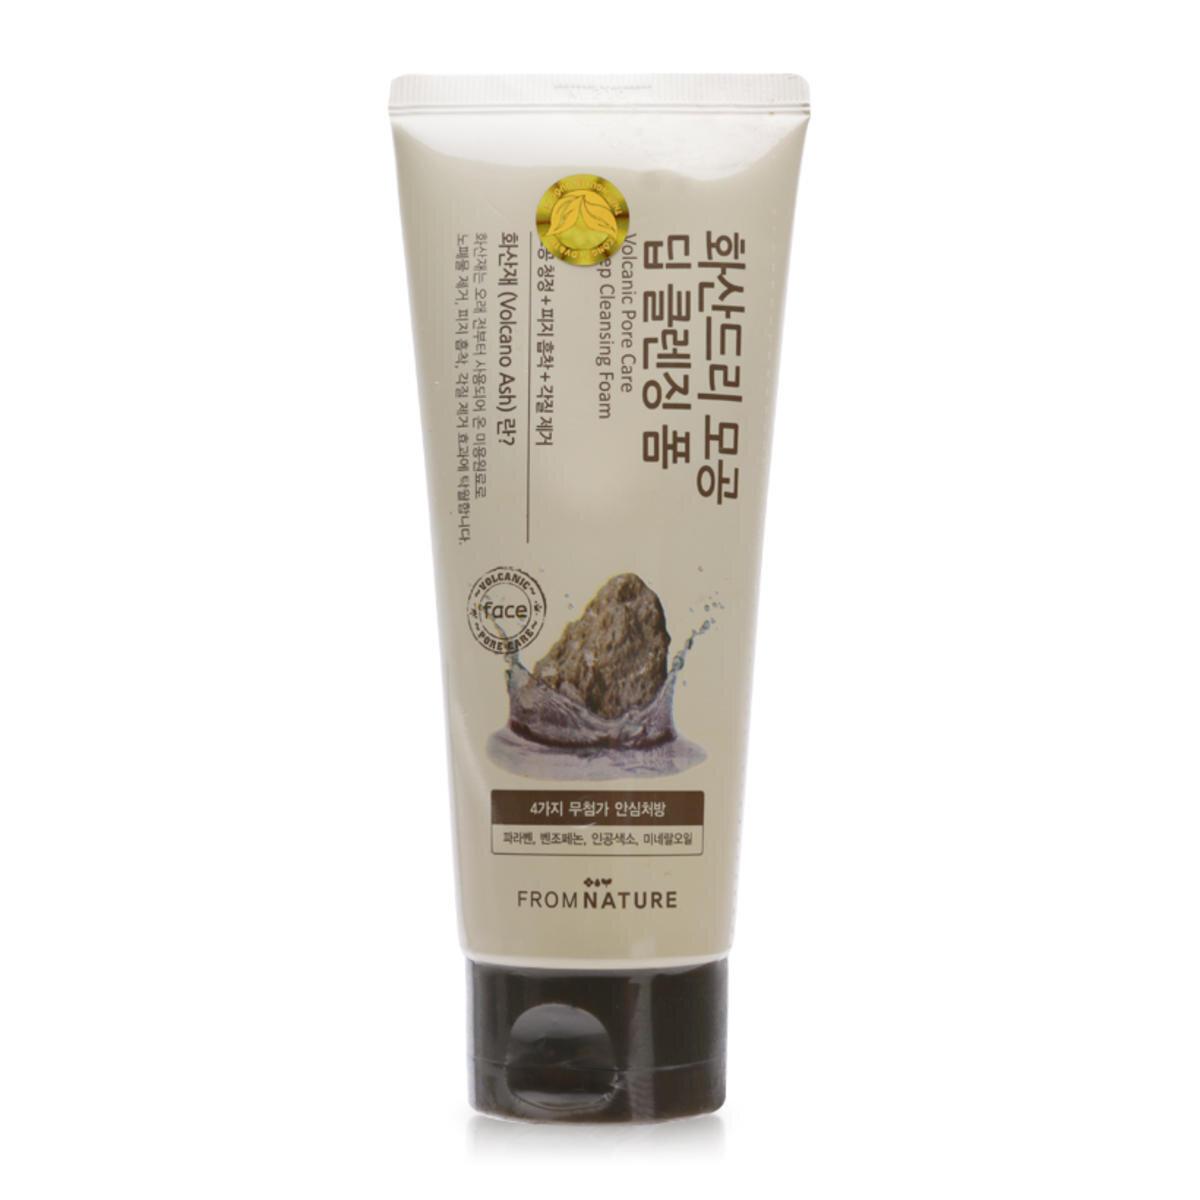 Sữa rửa mặt làm sạch lỗ chân lông From Nature Vocalnic Pore Care Deep Cleansing Foam 130g